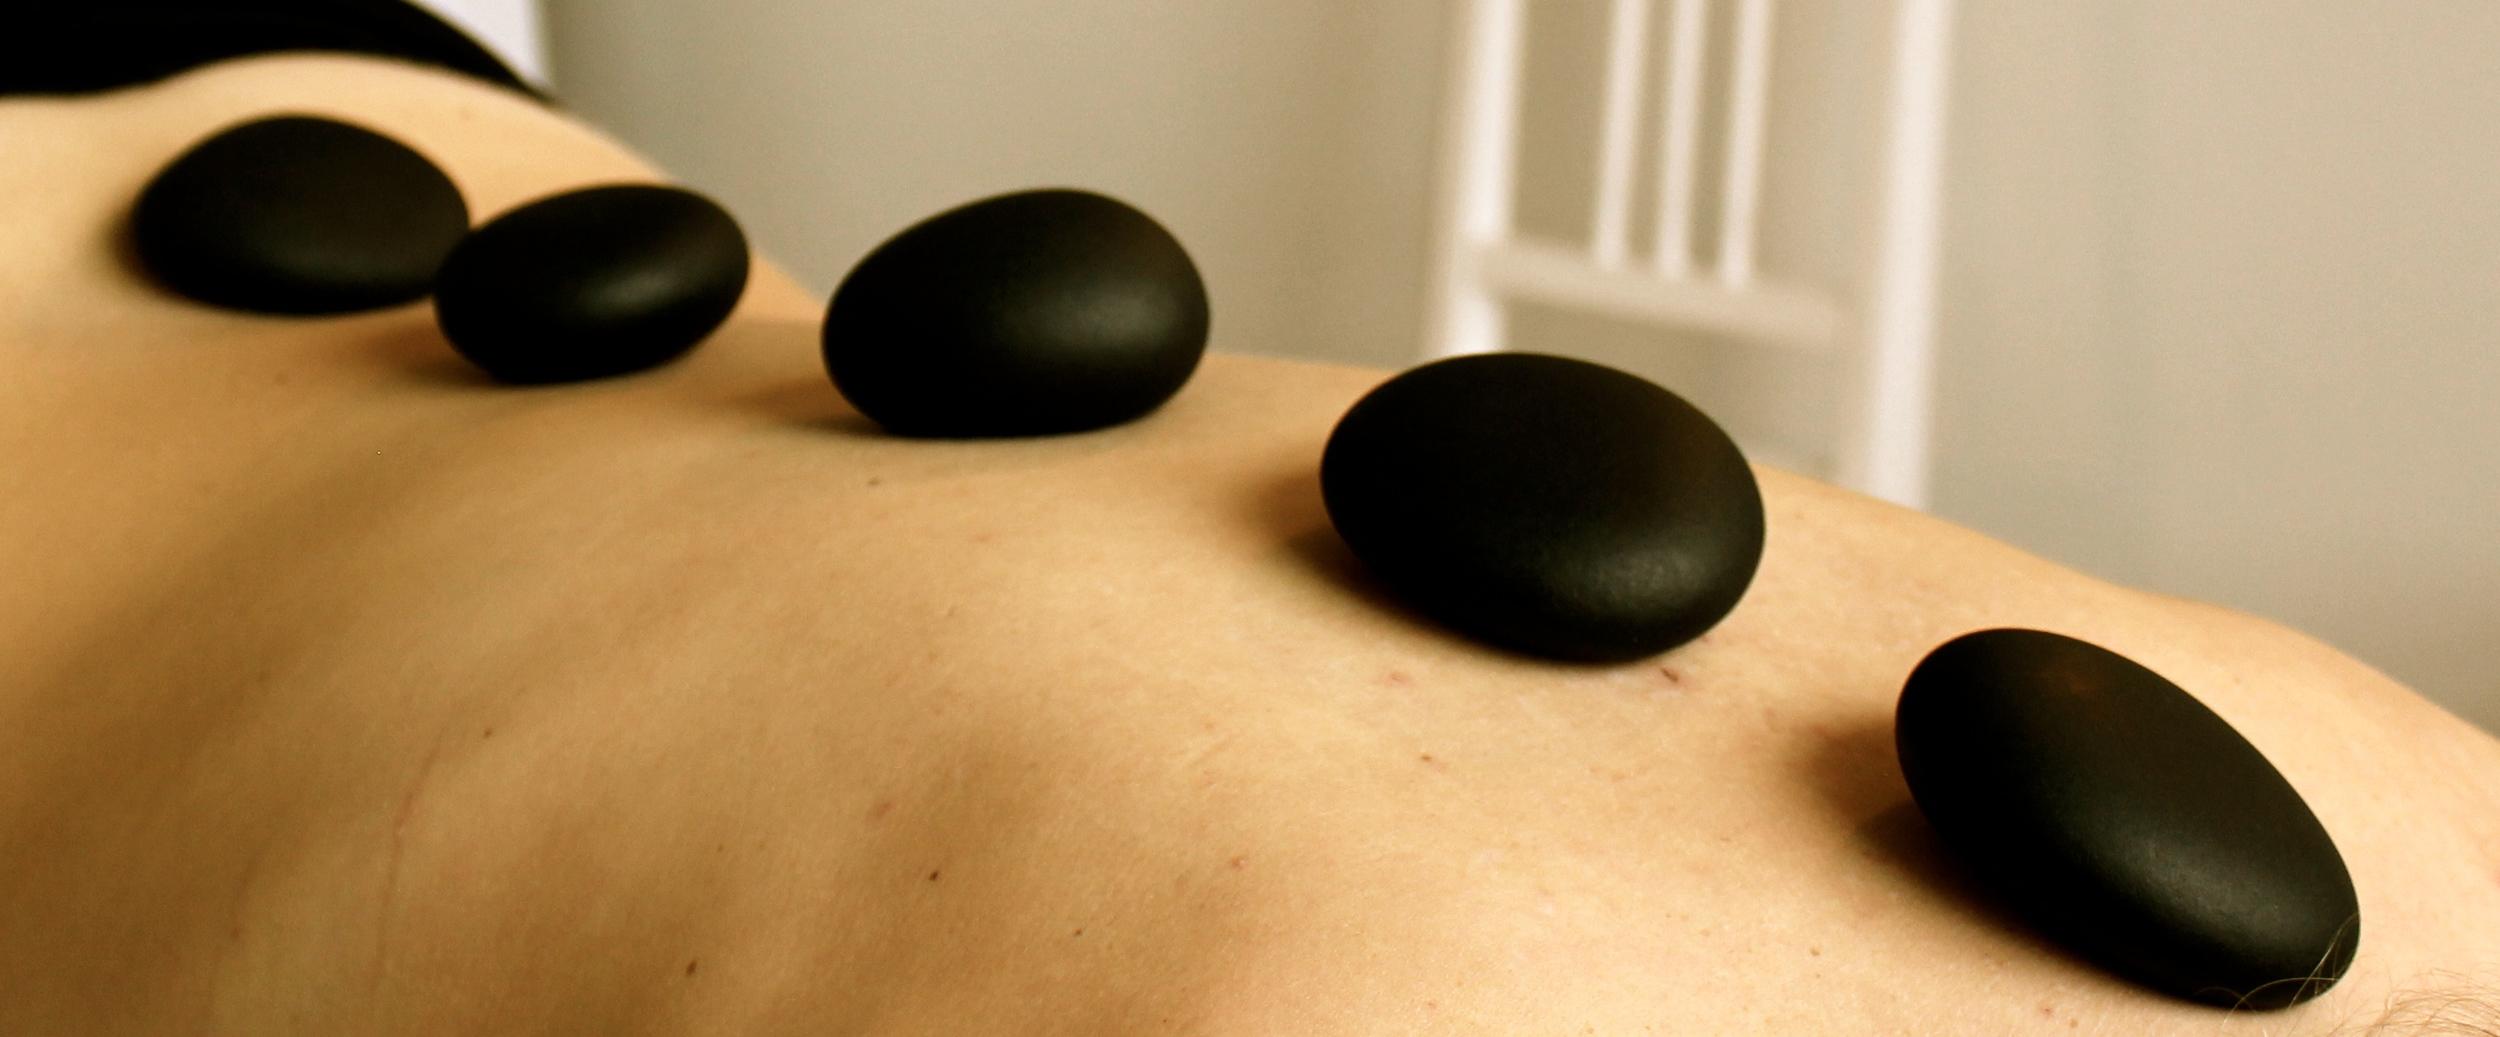 Hotstone massage, VitaPark Odder